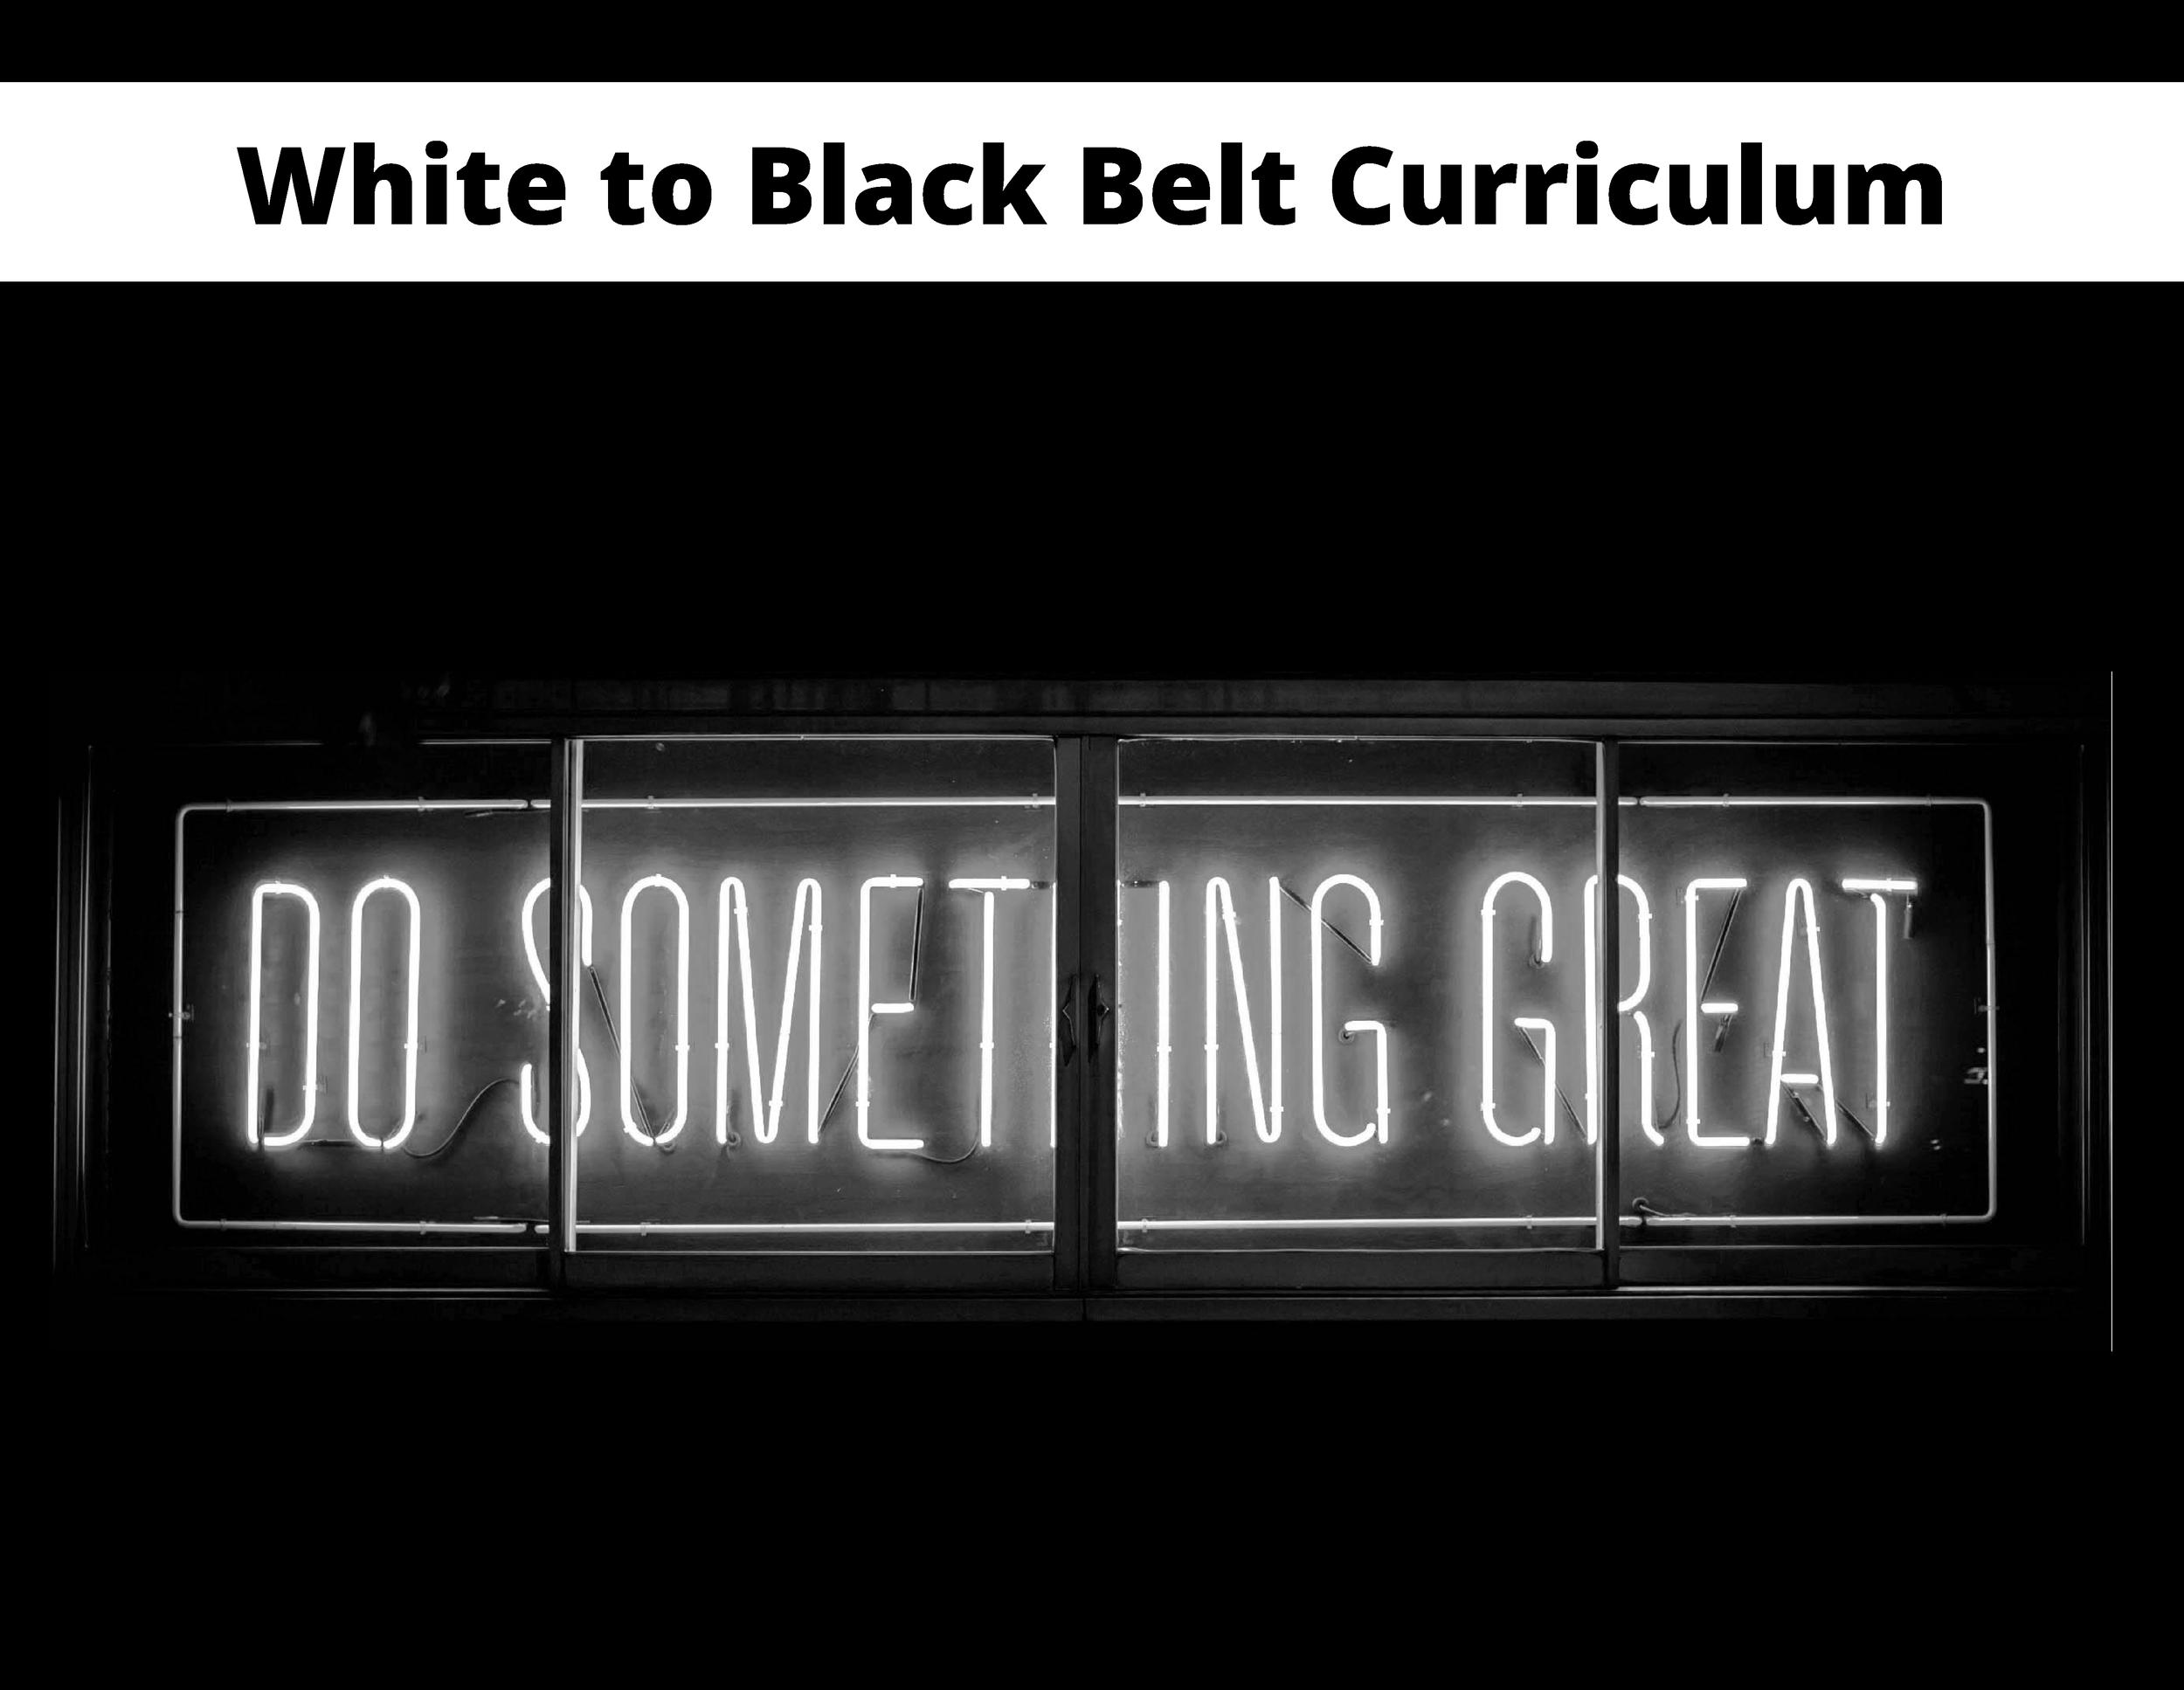 White to Black Belt Curriculum